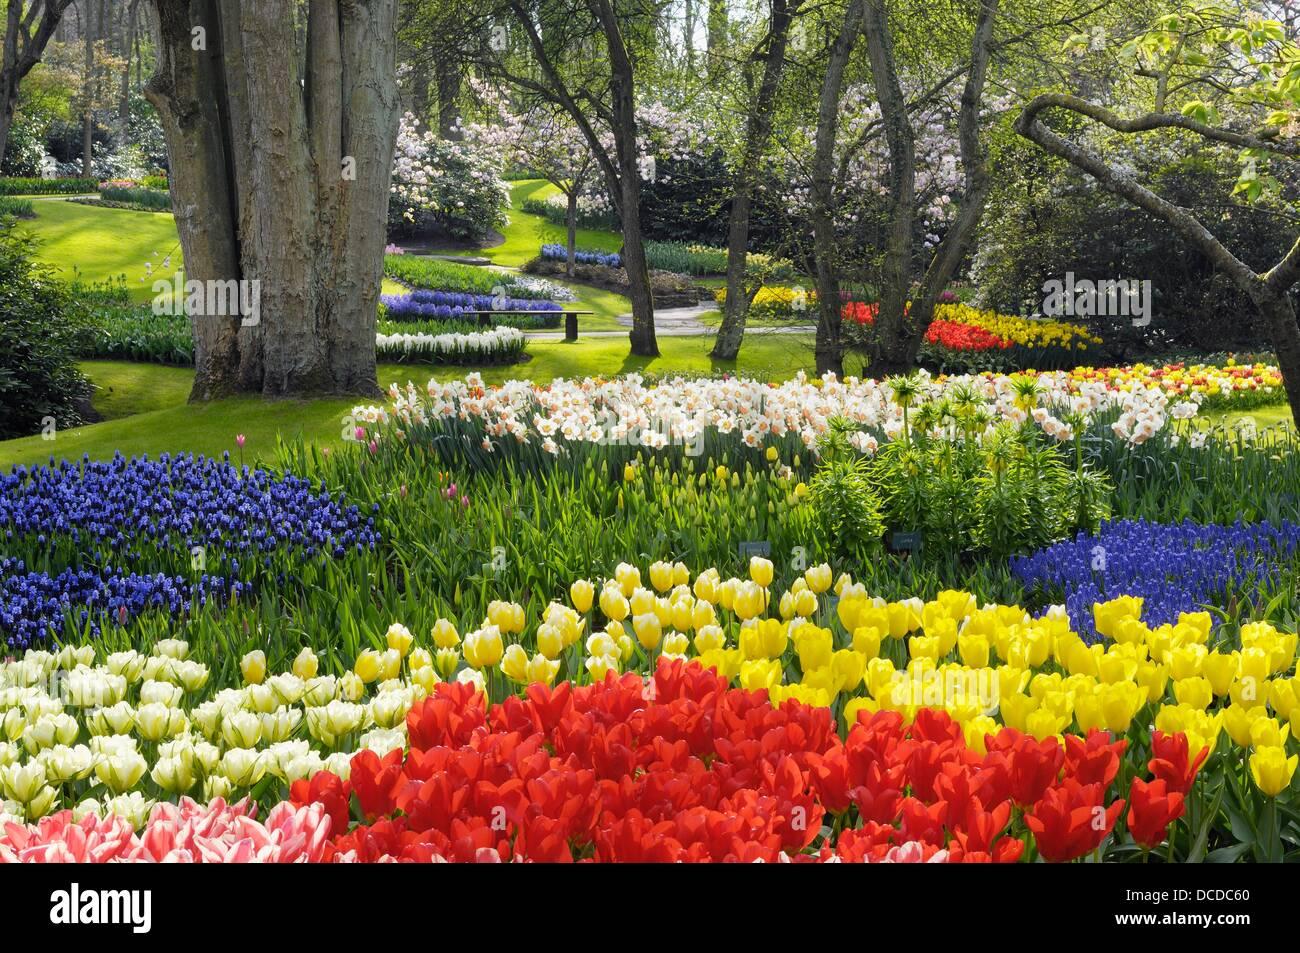 Formal Garden Design With Springtime Flowerbeds Of Tulips, Daffodils And  Hyacinths, Keukenhof Gardens, Lisse, Holland